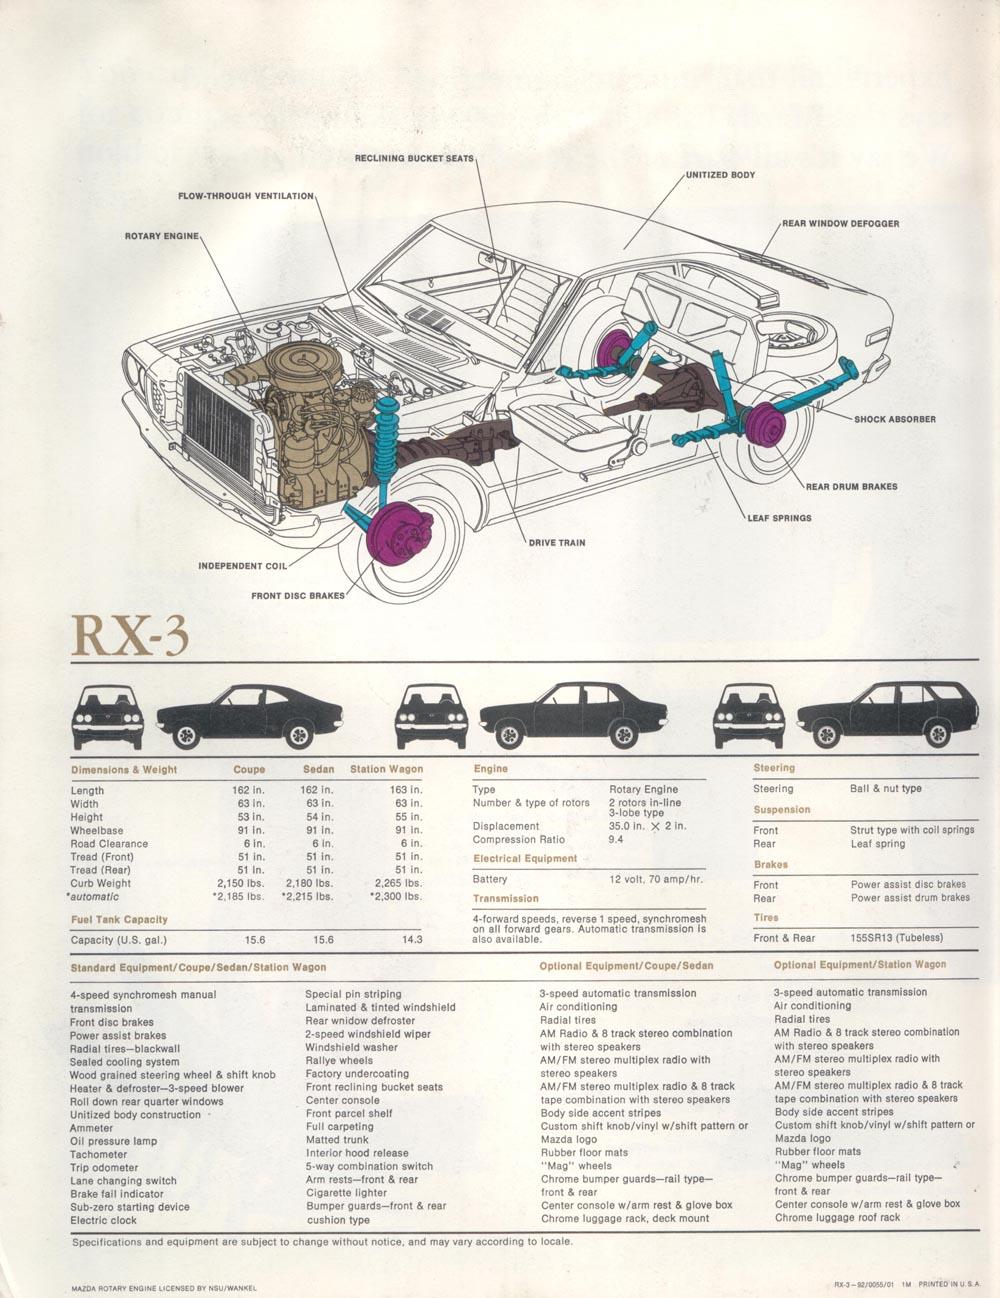 Index Of Rx 7 Brochure Rx3 1993 Mazda Rotary Engine Diagram Rx311